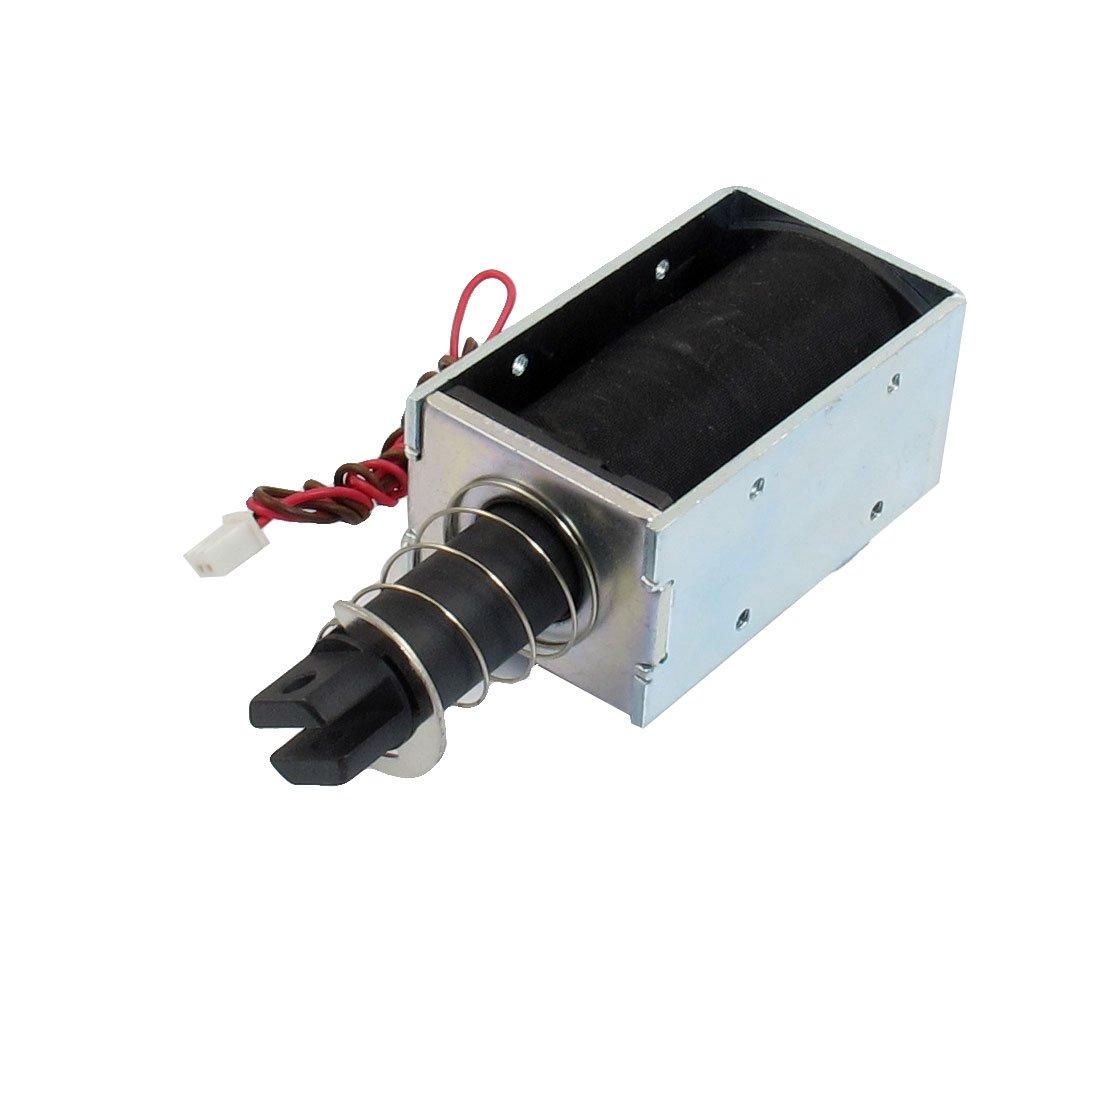 uxcell DC 12V 0.96A 100GF Force 19mm Stroke Solenoid Electromagnet